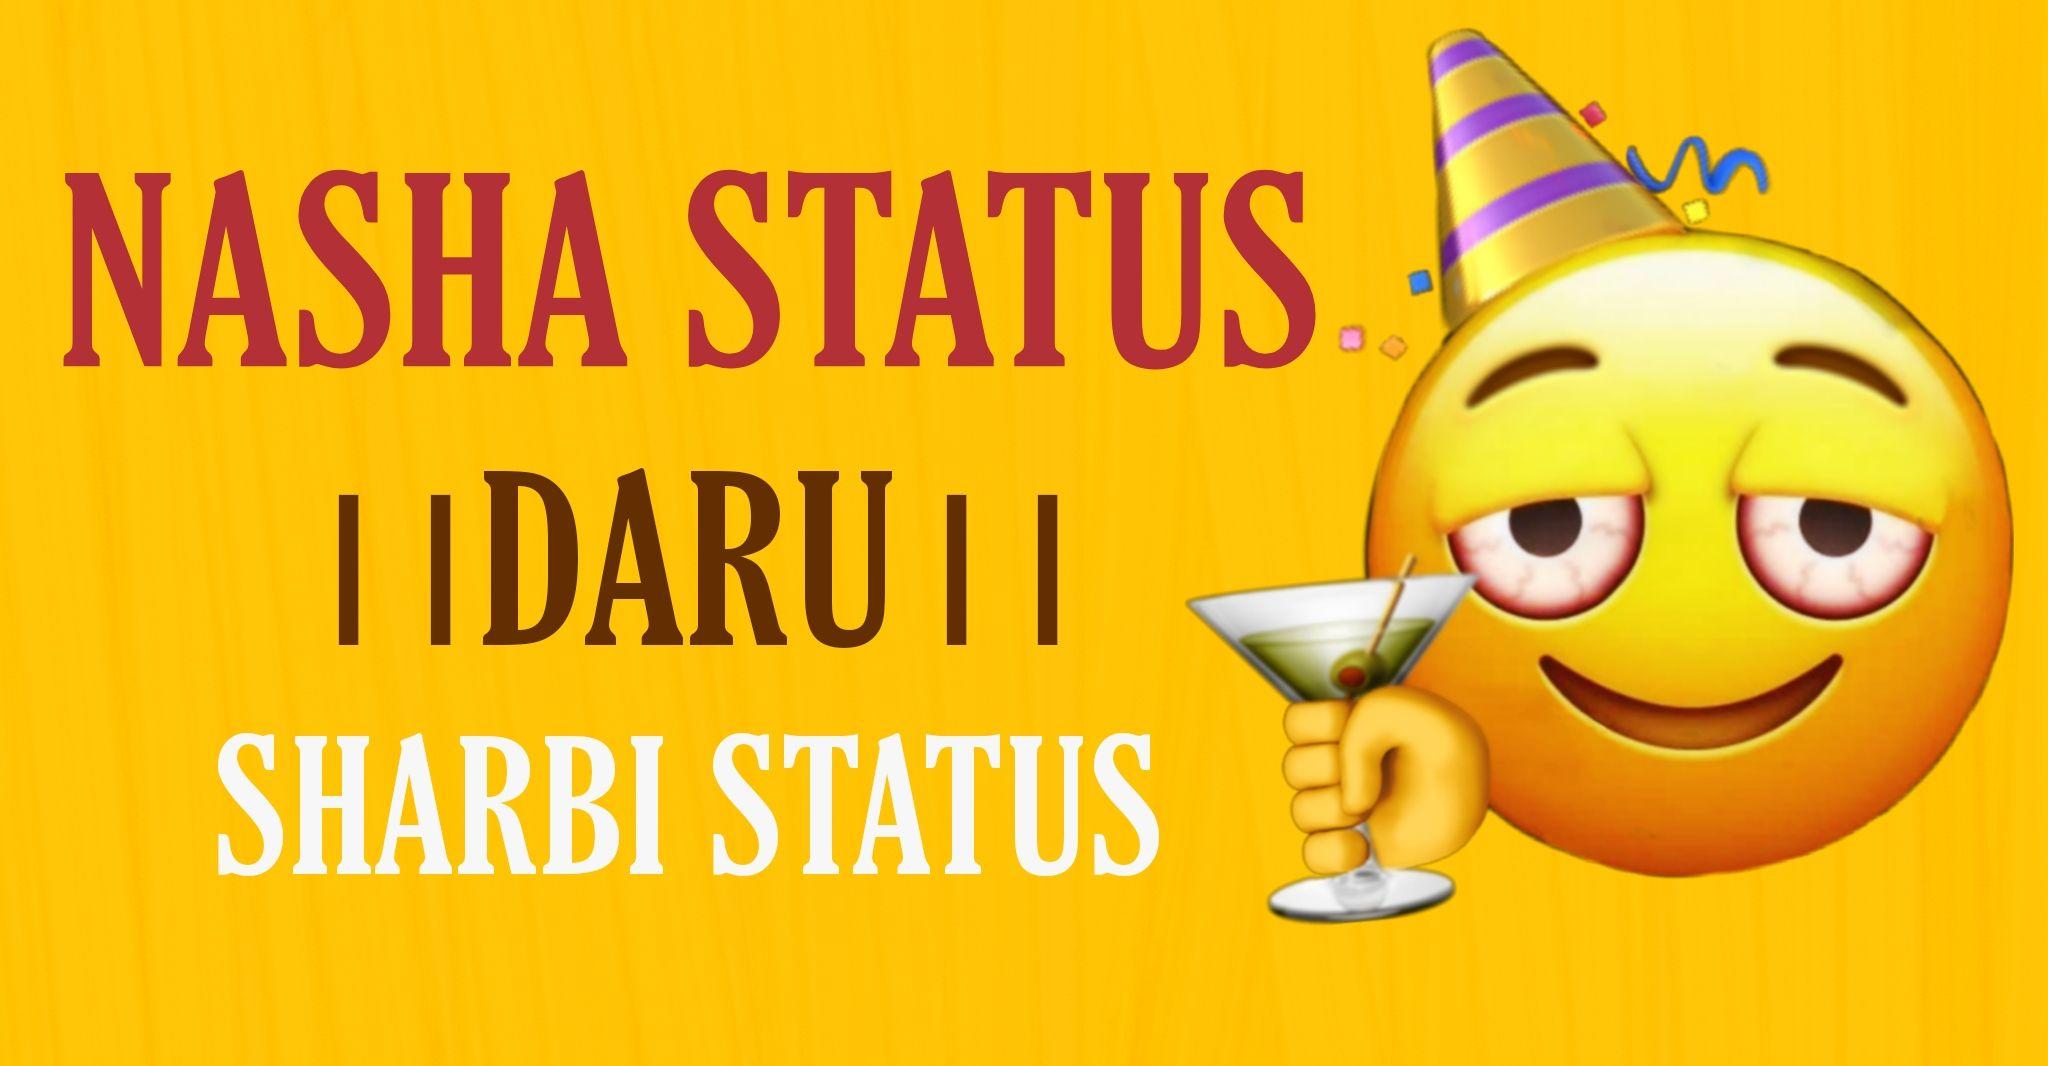 Daru Status, Nasha Status, Sharbi Status